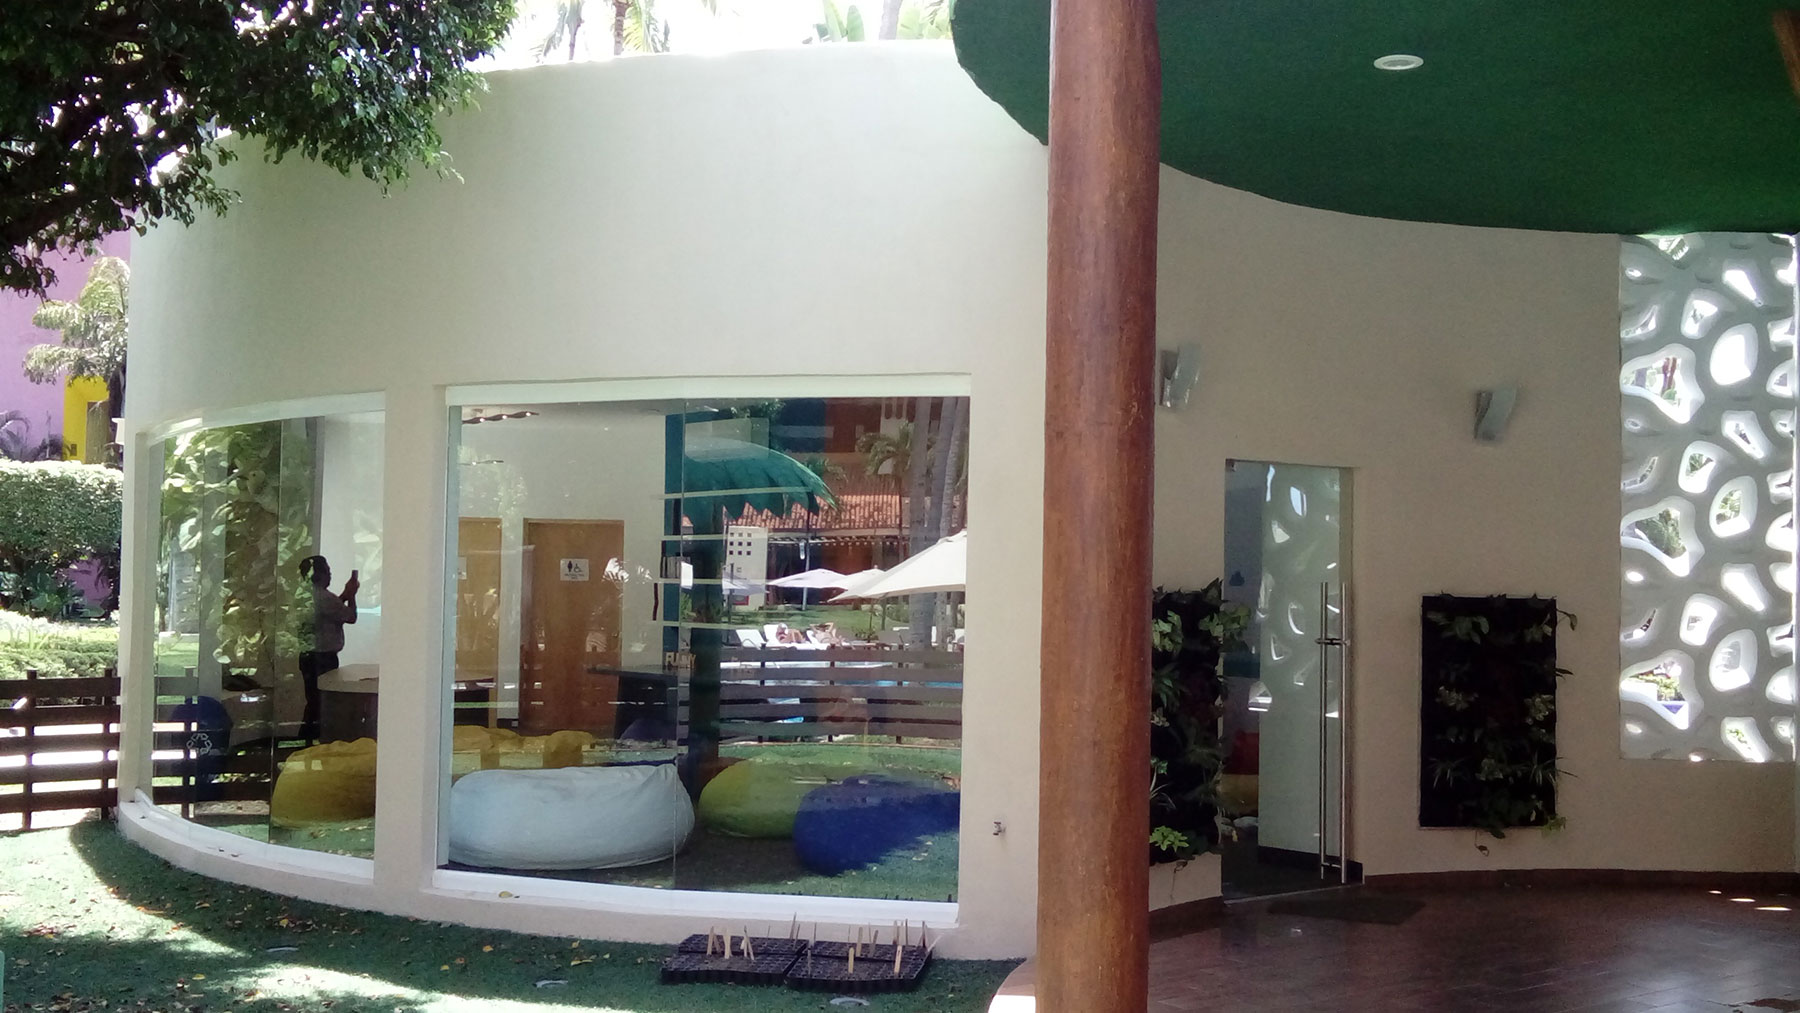 Proyectos SPAD Constructora, Westin Family Kids Club, Exterior jardín, Diseño de Interiores, Arquitectura, Puerto Vallarta, Jalisco, México